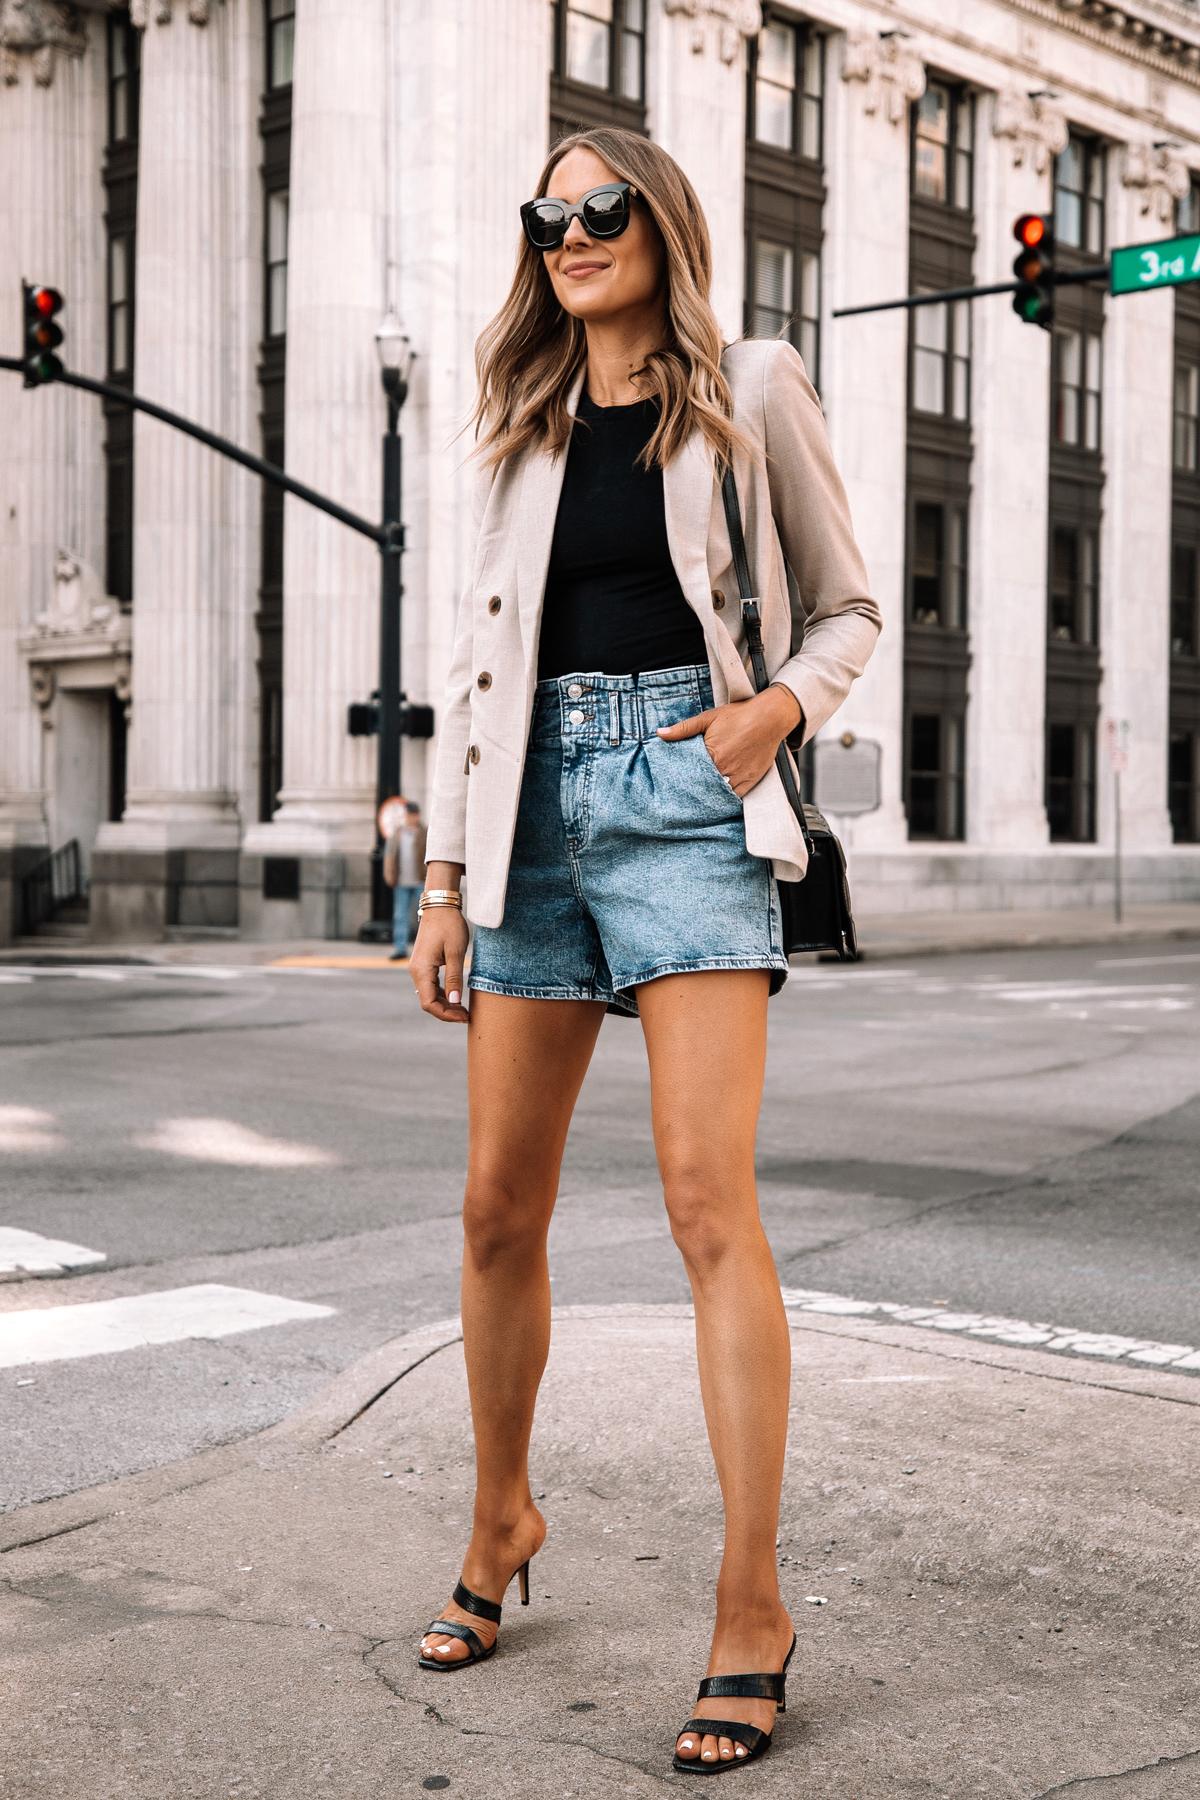 Fashion Jackson Wearing Beige Blazer Denim Shorts Black Heels Street Style Spring Outfit 1